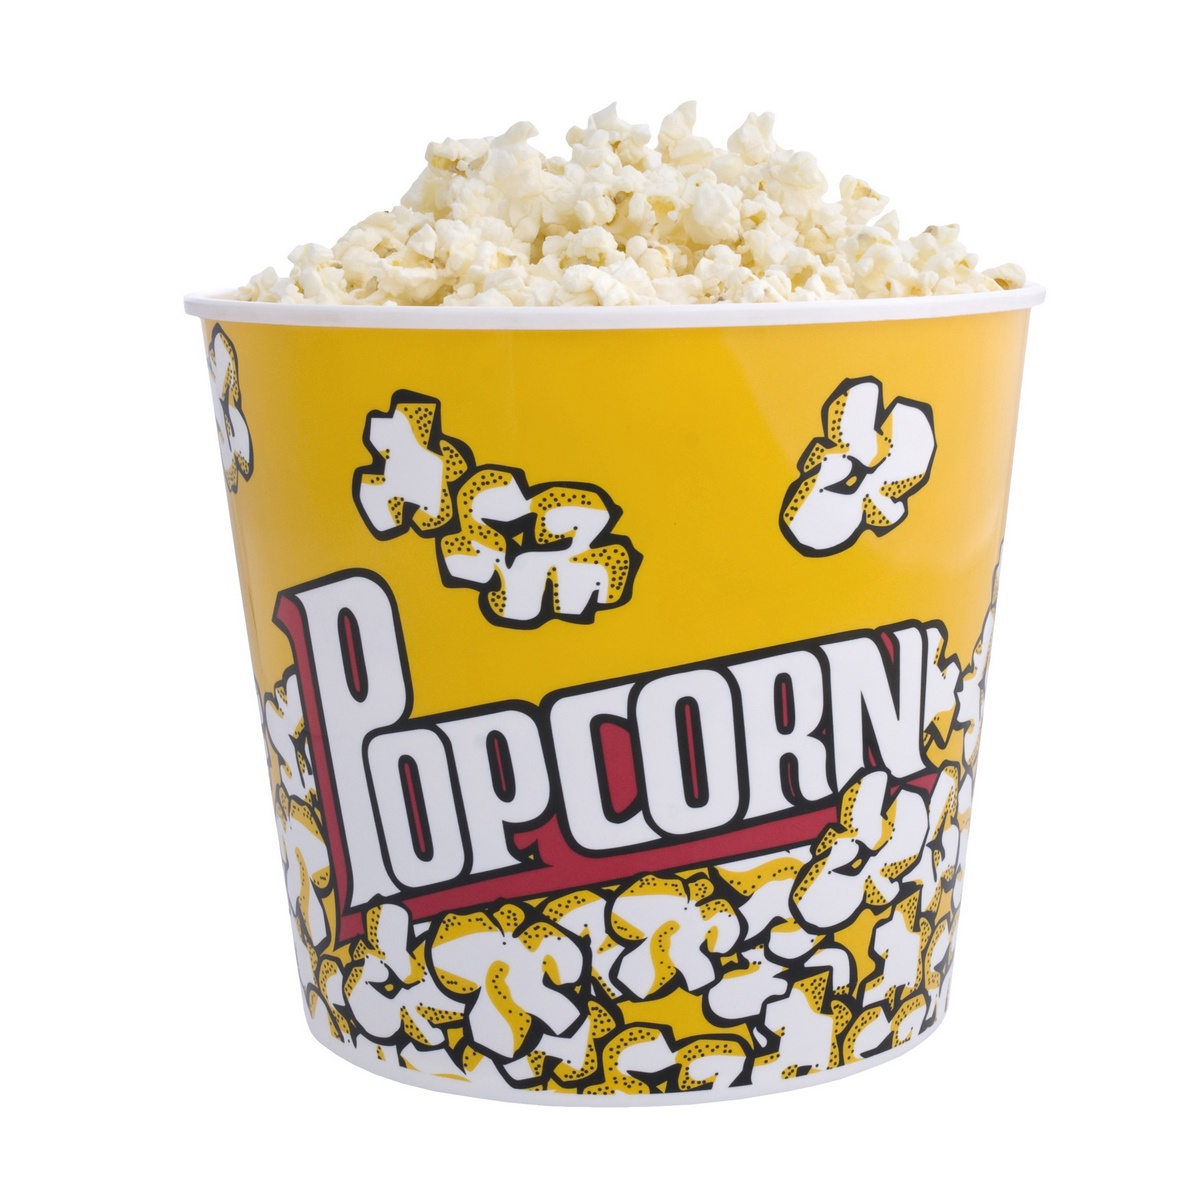 цены Подстаканник Balvi для попкорна Pop Corn, 2,8 л, желтый, белый